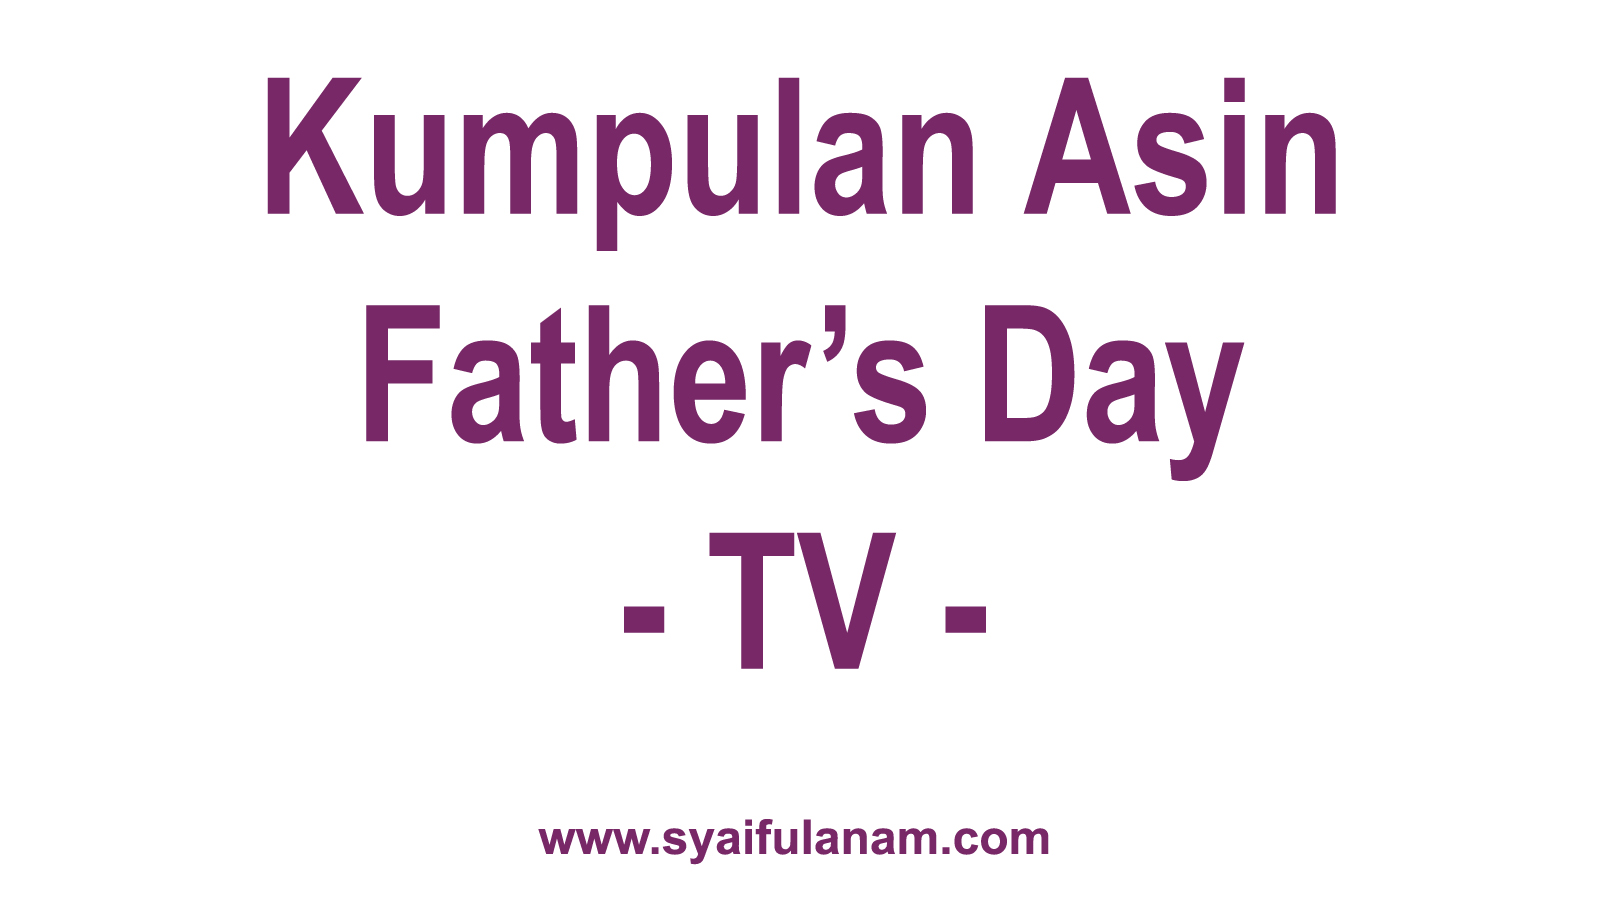 Kumpulan Asin Father's Day TV